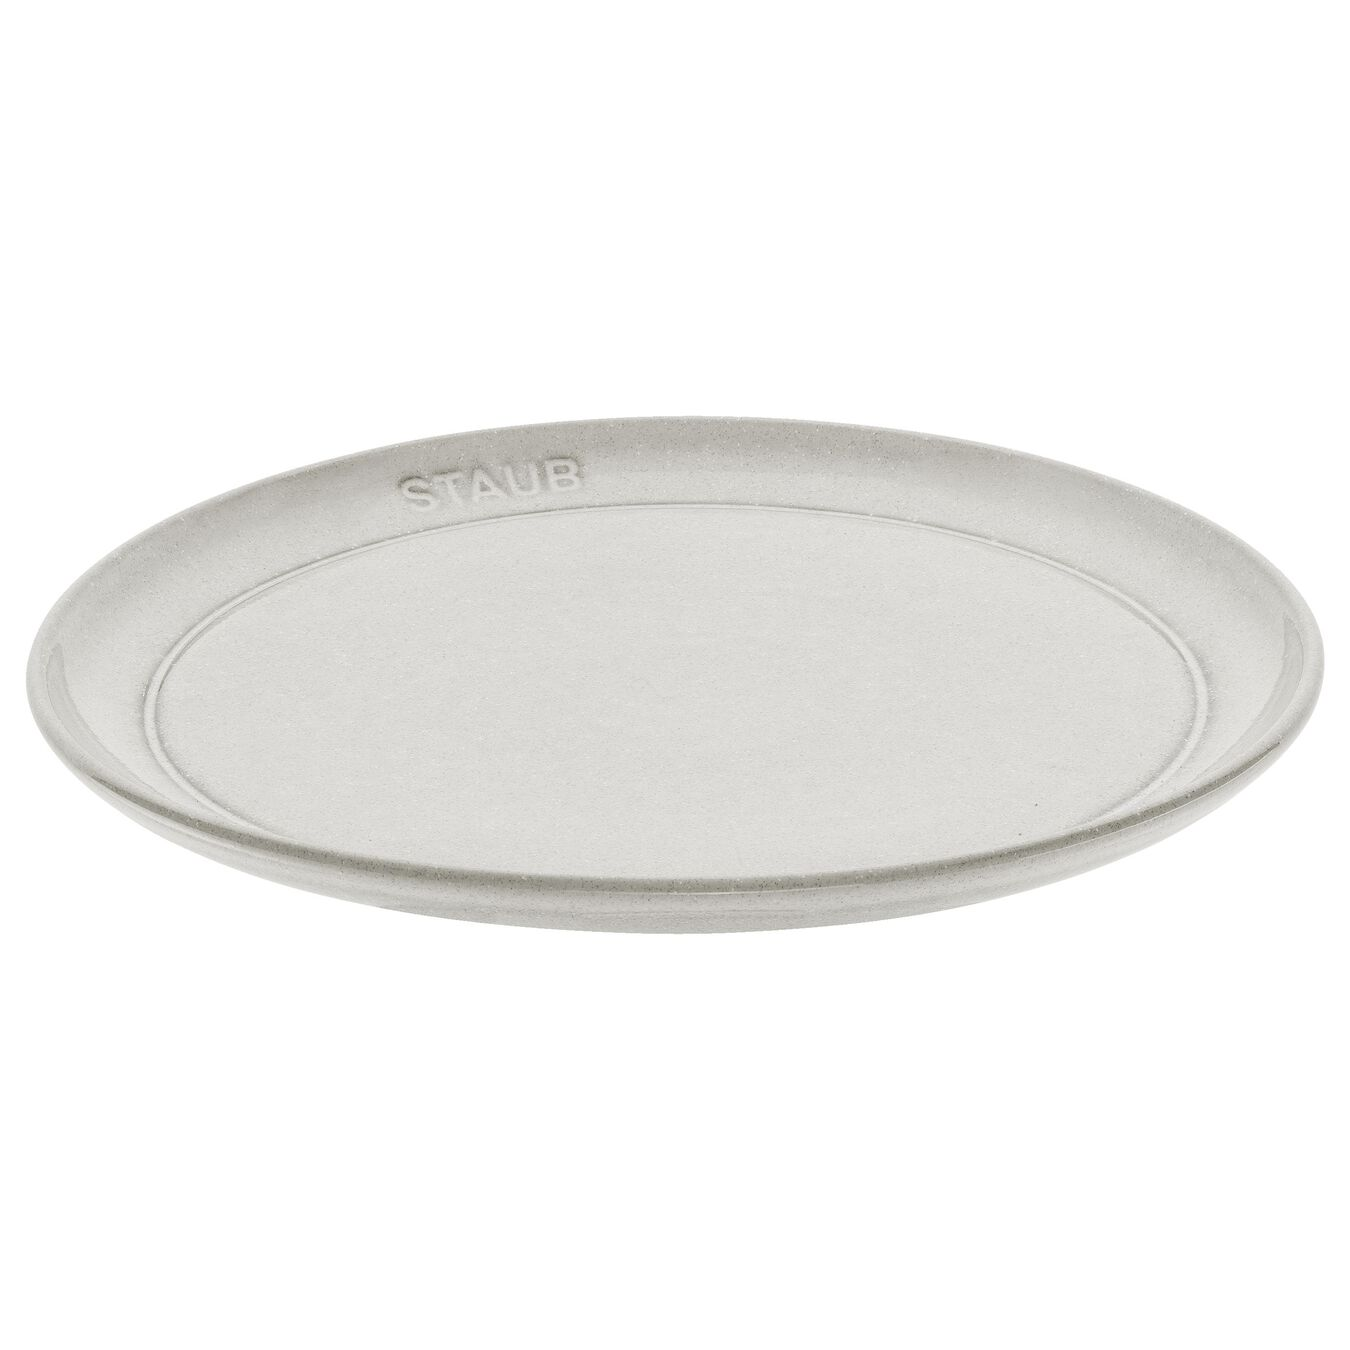 Set d'assiettes à pâtes, 4-pcs   White Truffle   Ceramic   round   Ceramic,,large 1